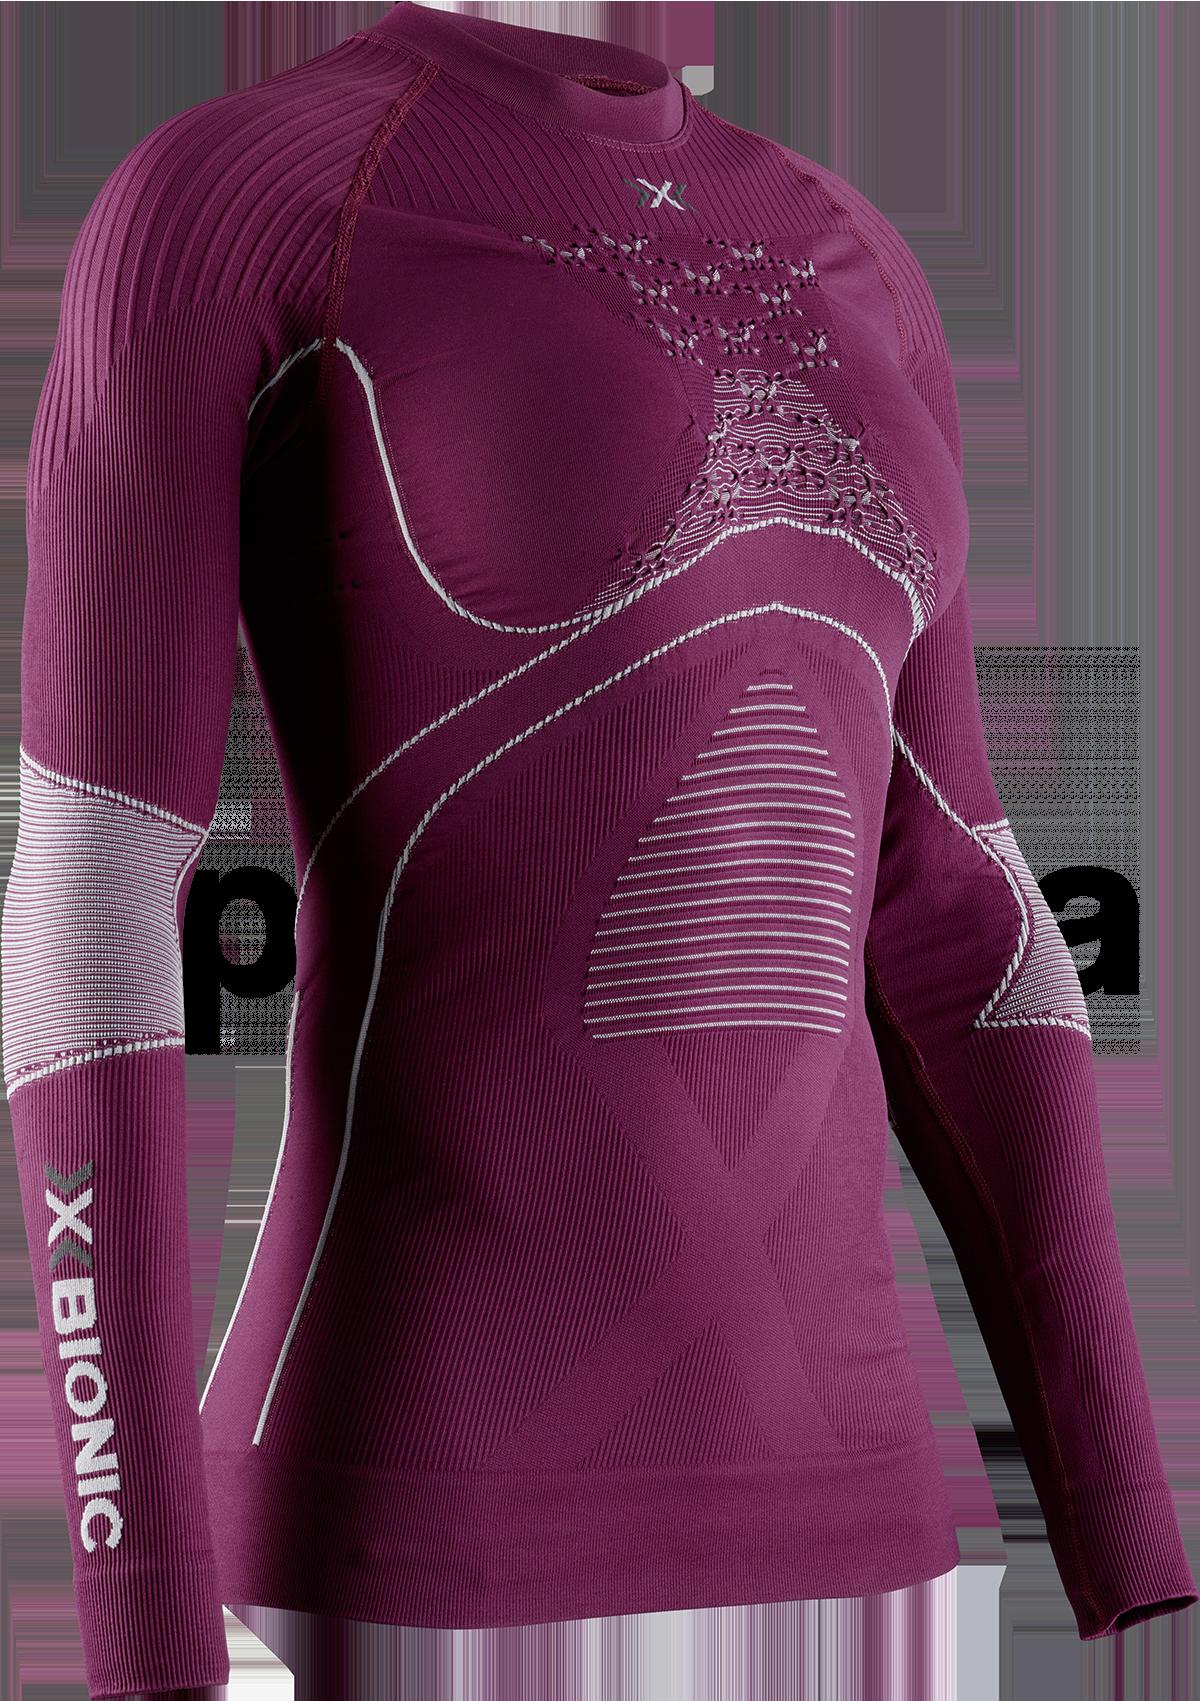 X-Bionic Energy Accumulator 4.0 shirt round neck LG SL W